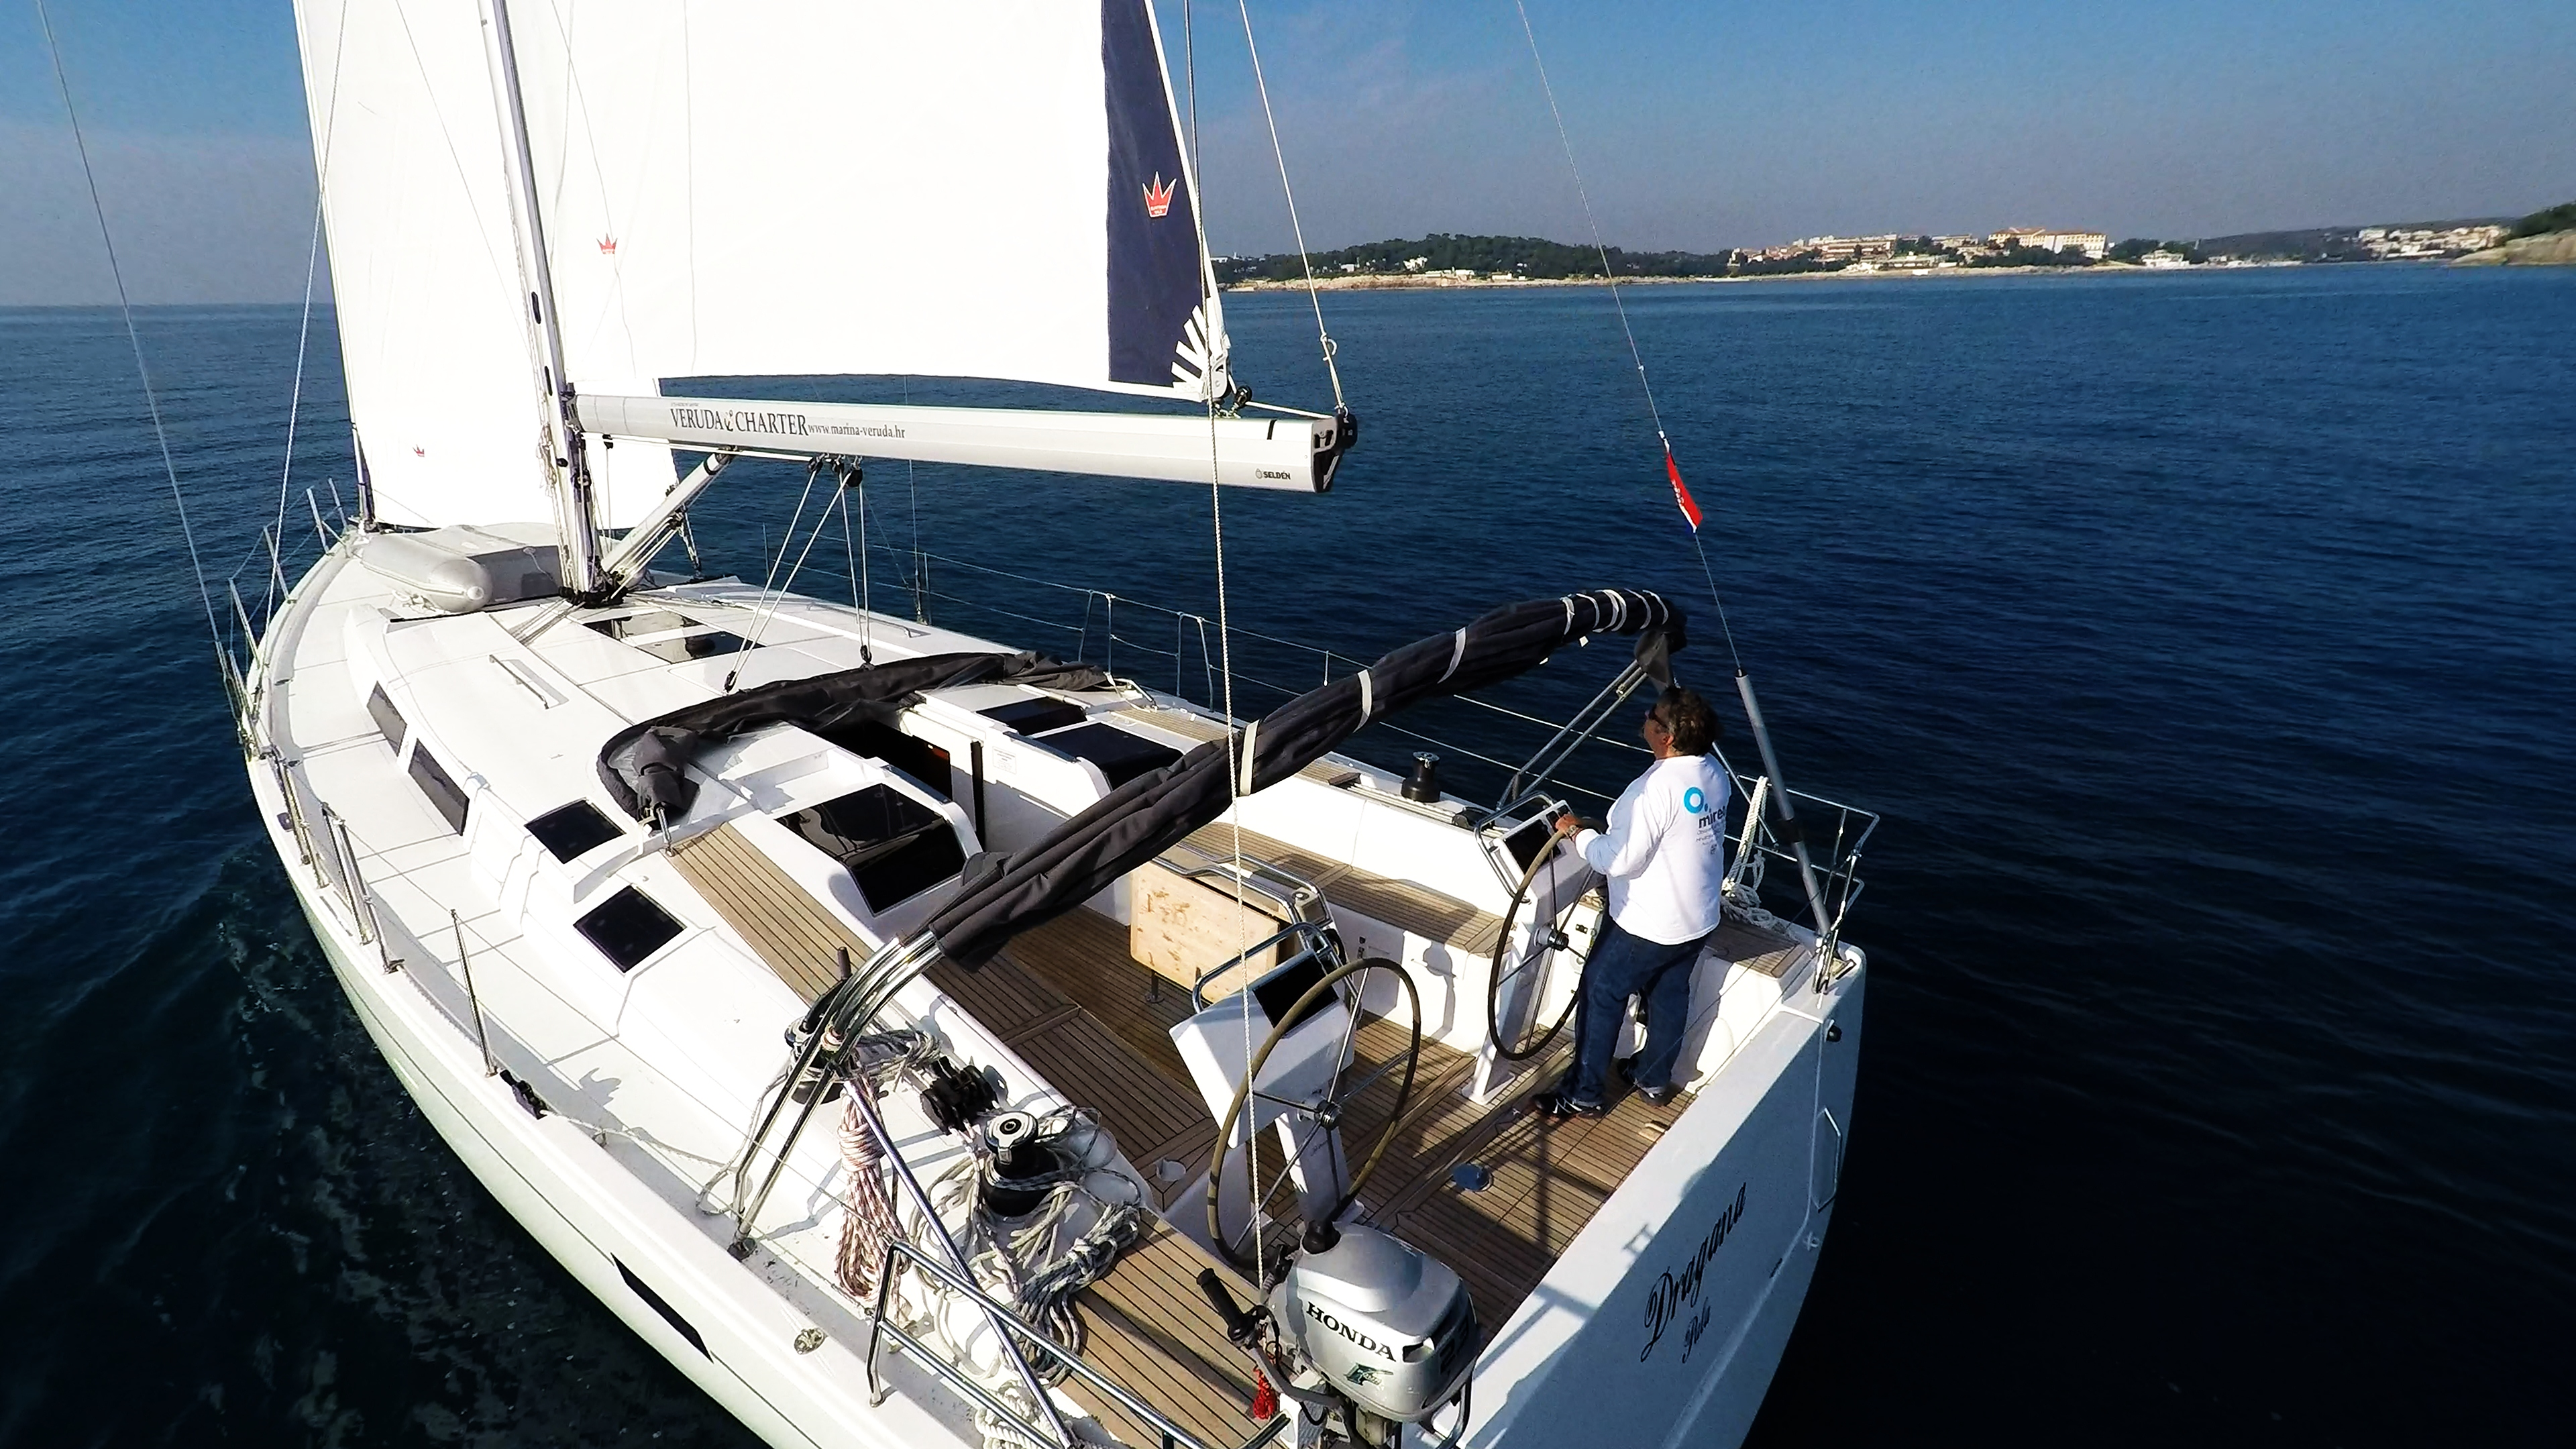 barcha a vela ponte pozzetto yacht a vela Hanse 505 timoni ruota